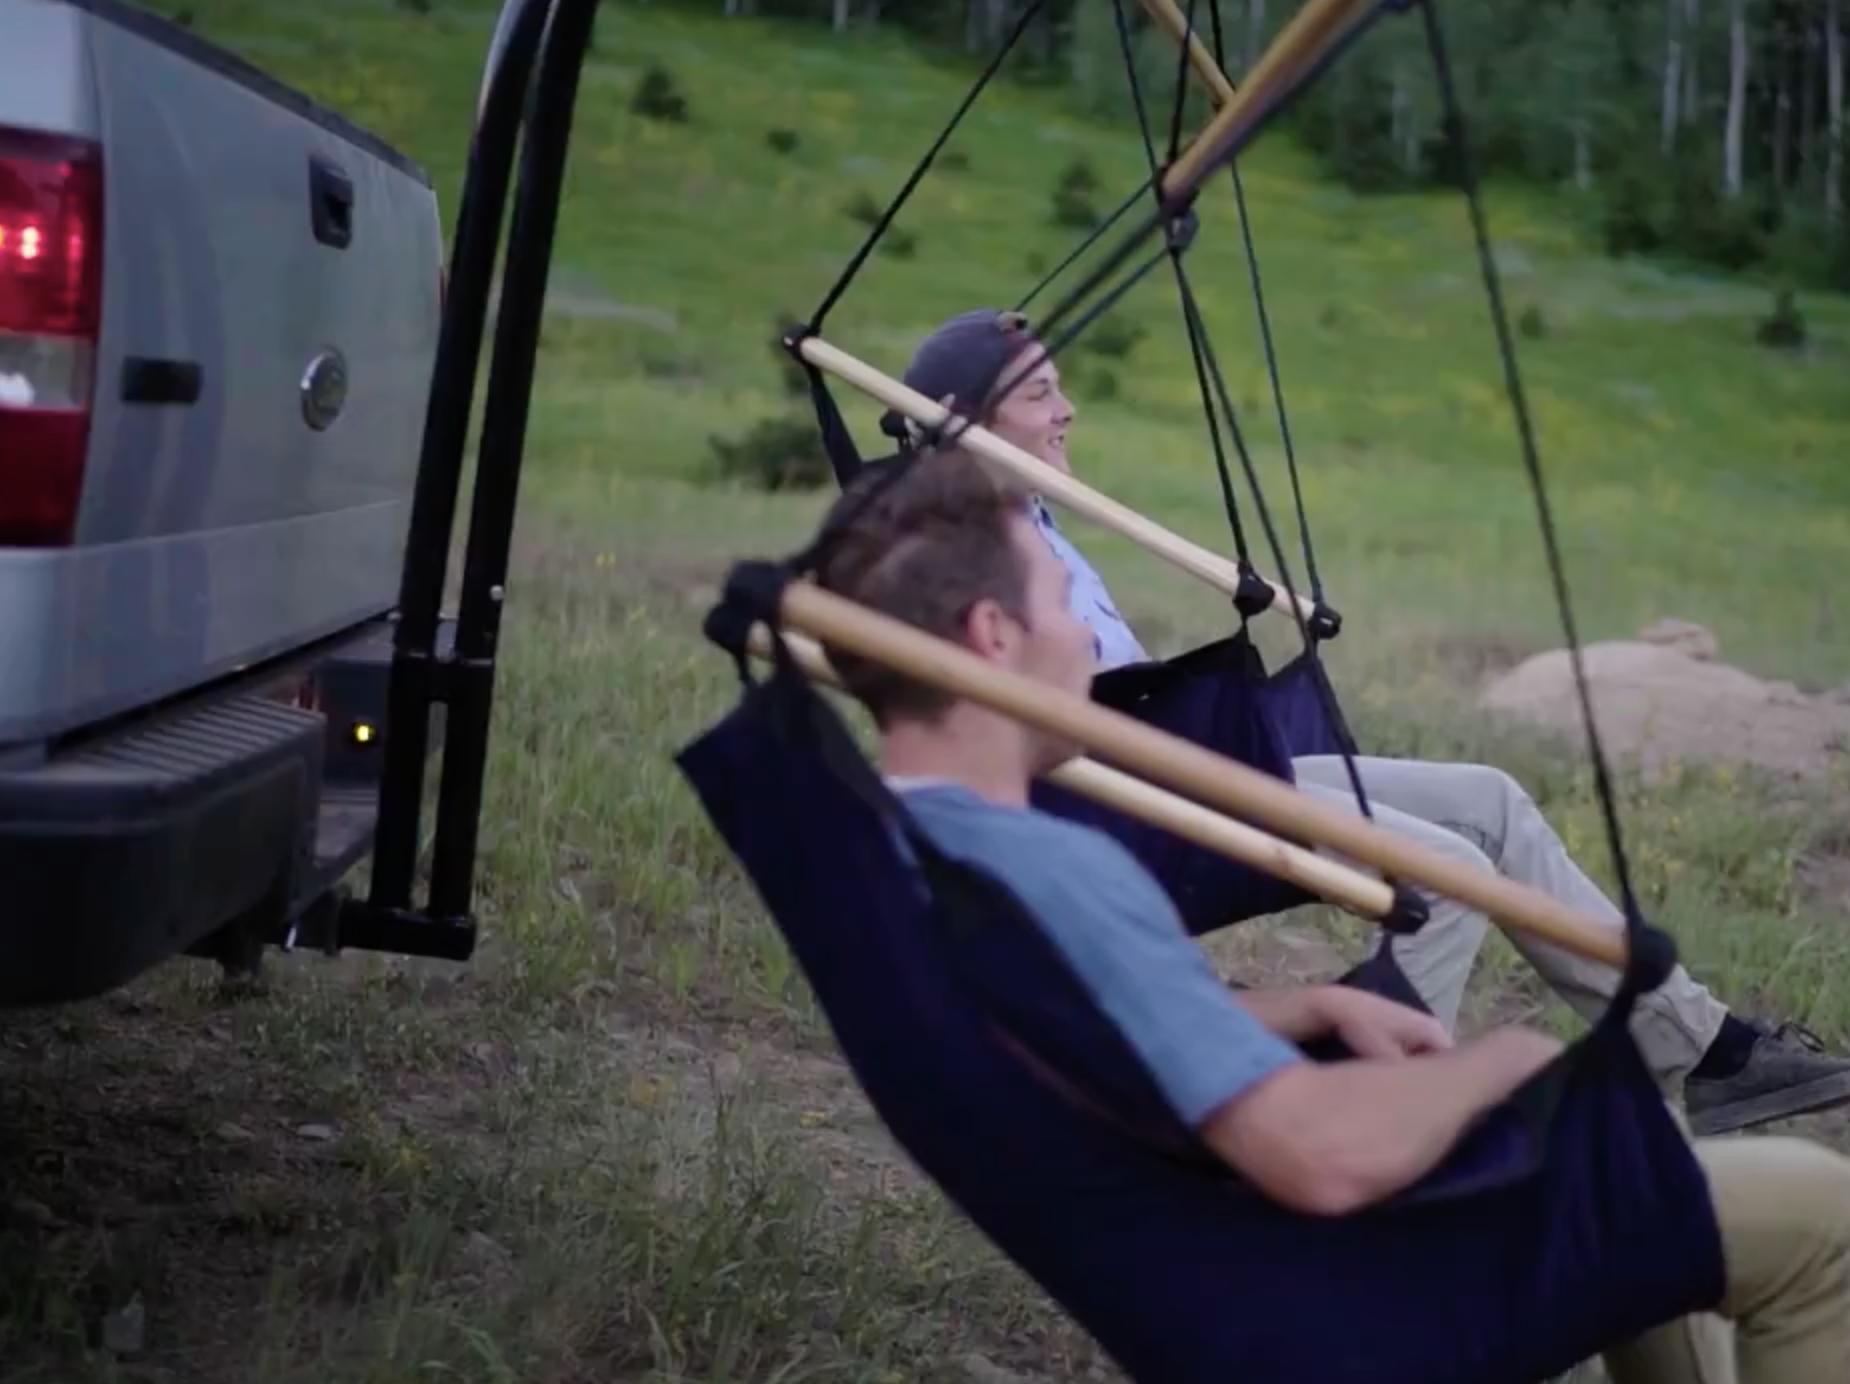 Trailer Hitch Hammock Chairs